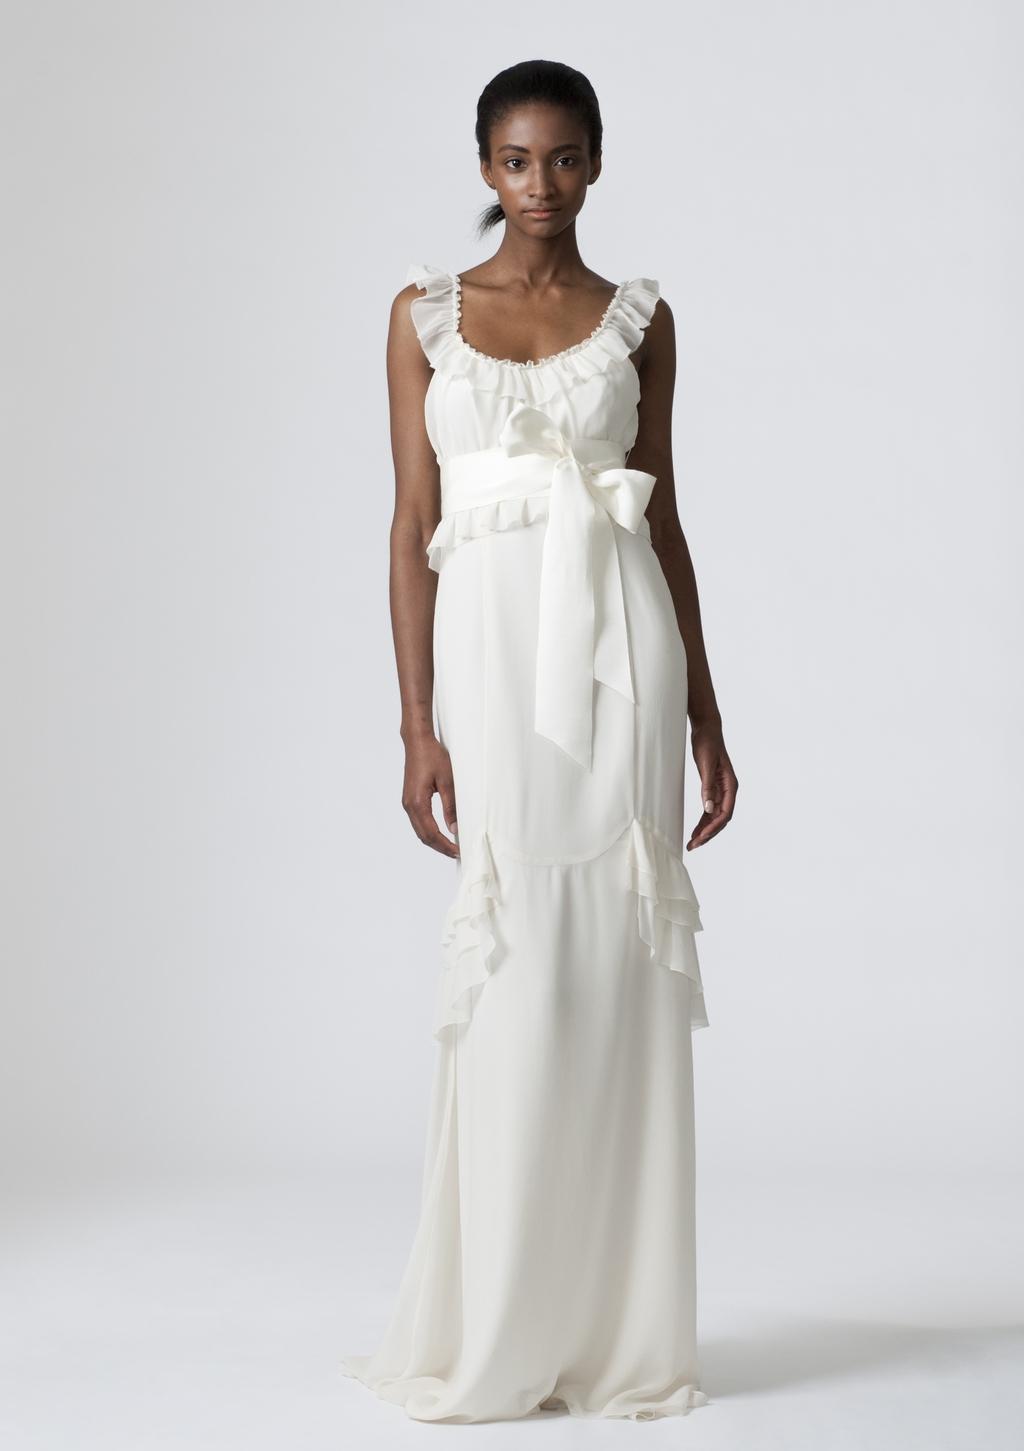 Vera-wang-wedding-dresses-spring-2010-15.full